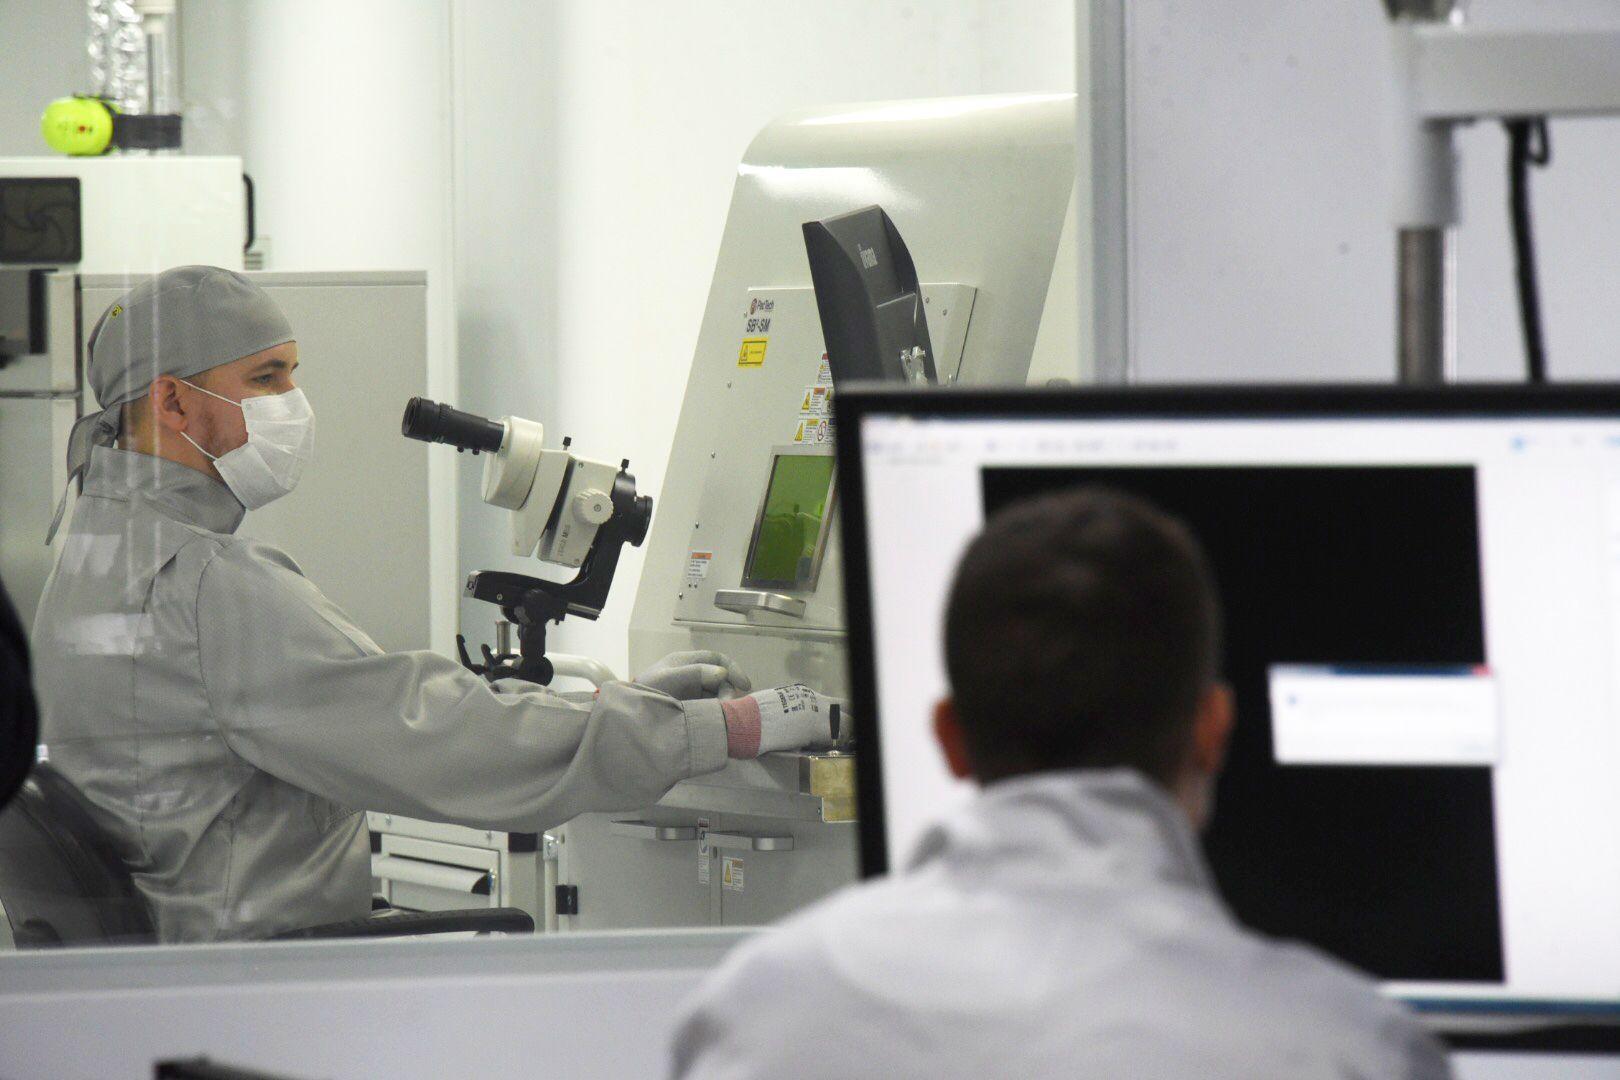 Более 1300 человек заразились коронавирусом в Москве за сутки